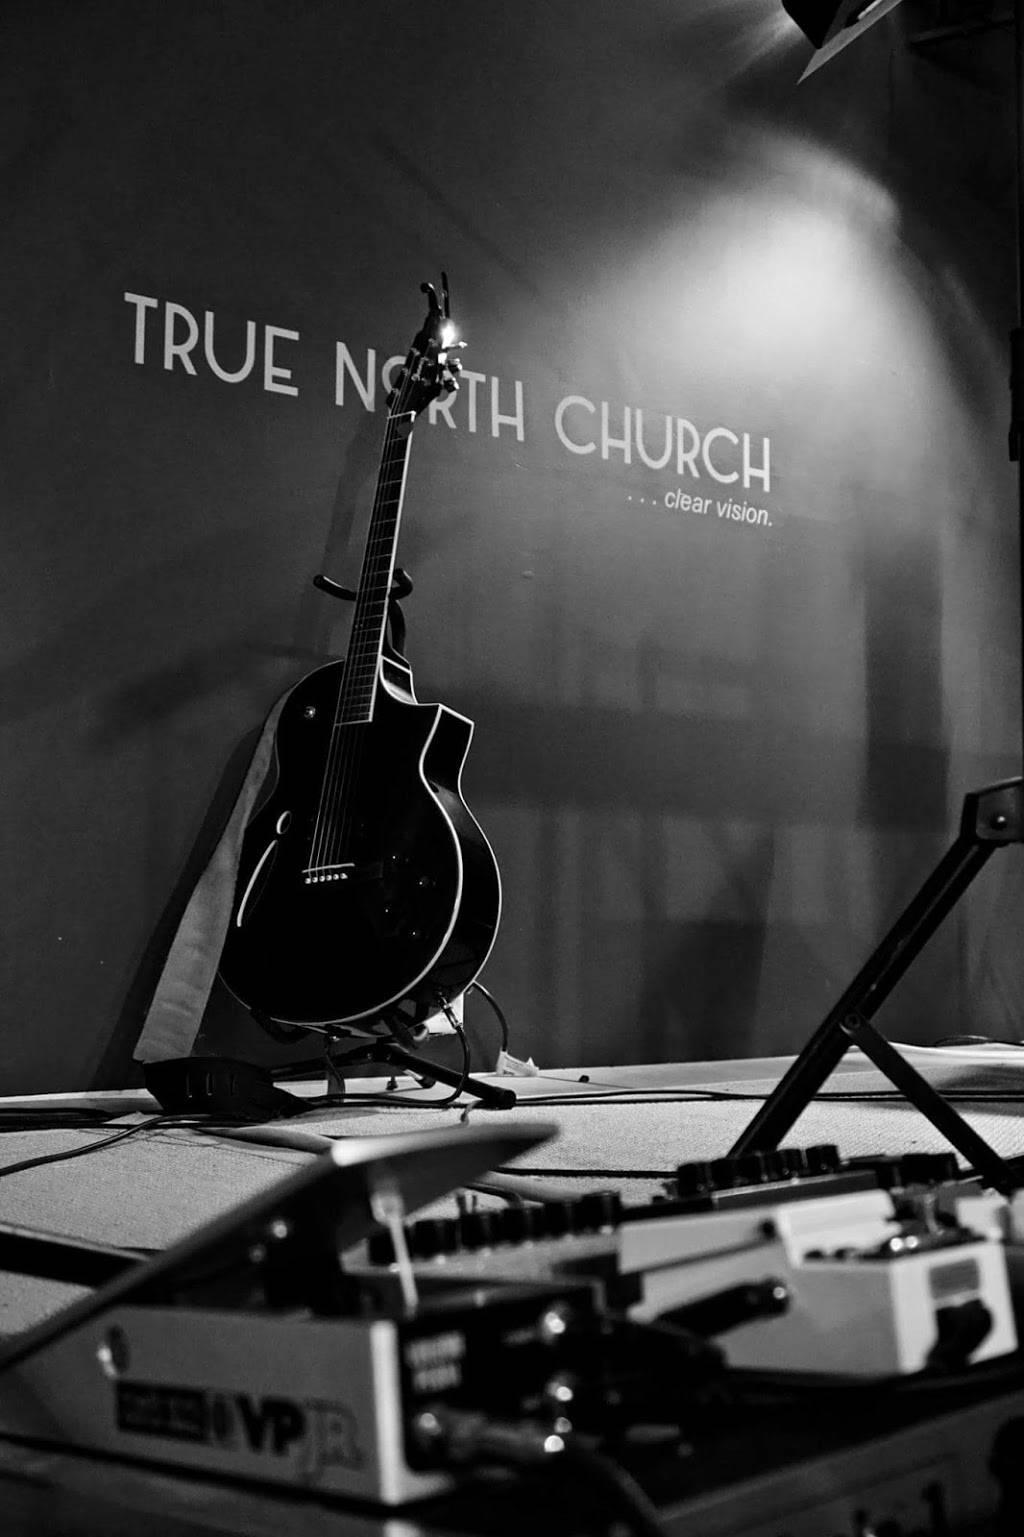 True NORTH Church - church  | Photo 3 of 3 | Address: 8680 Main St #1e, Frisco, TX 75033, USA | Phone: (214) 585-8071